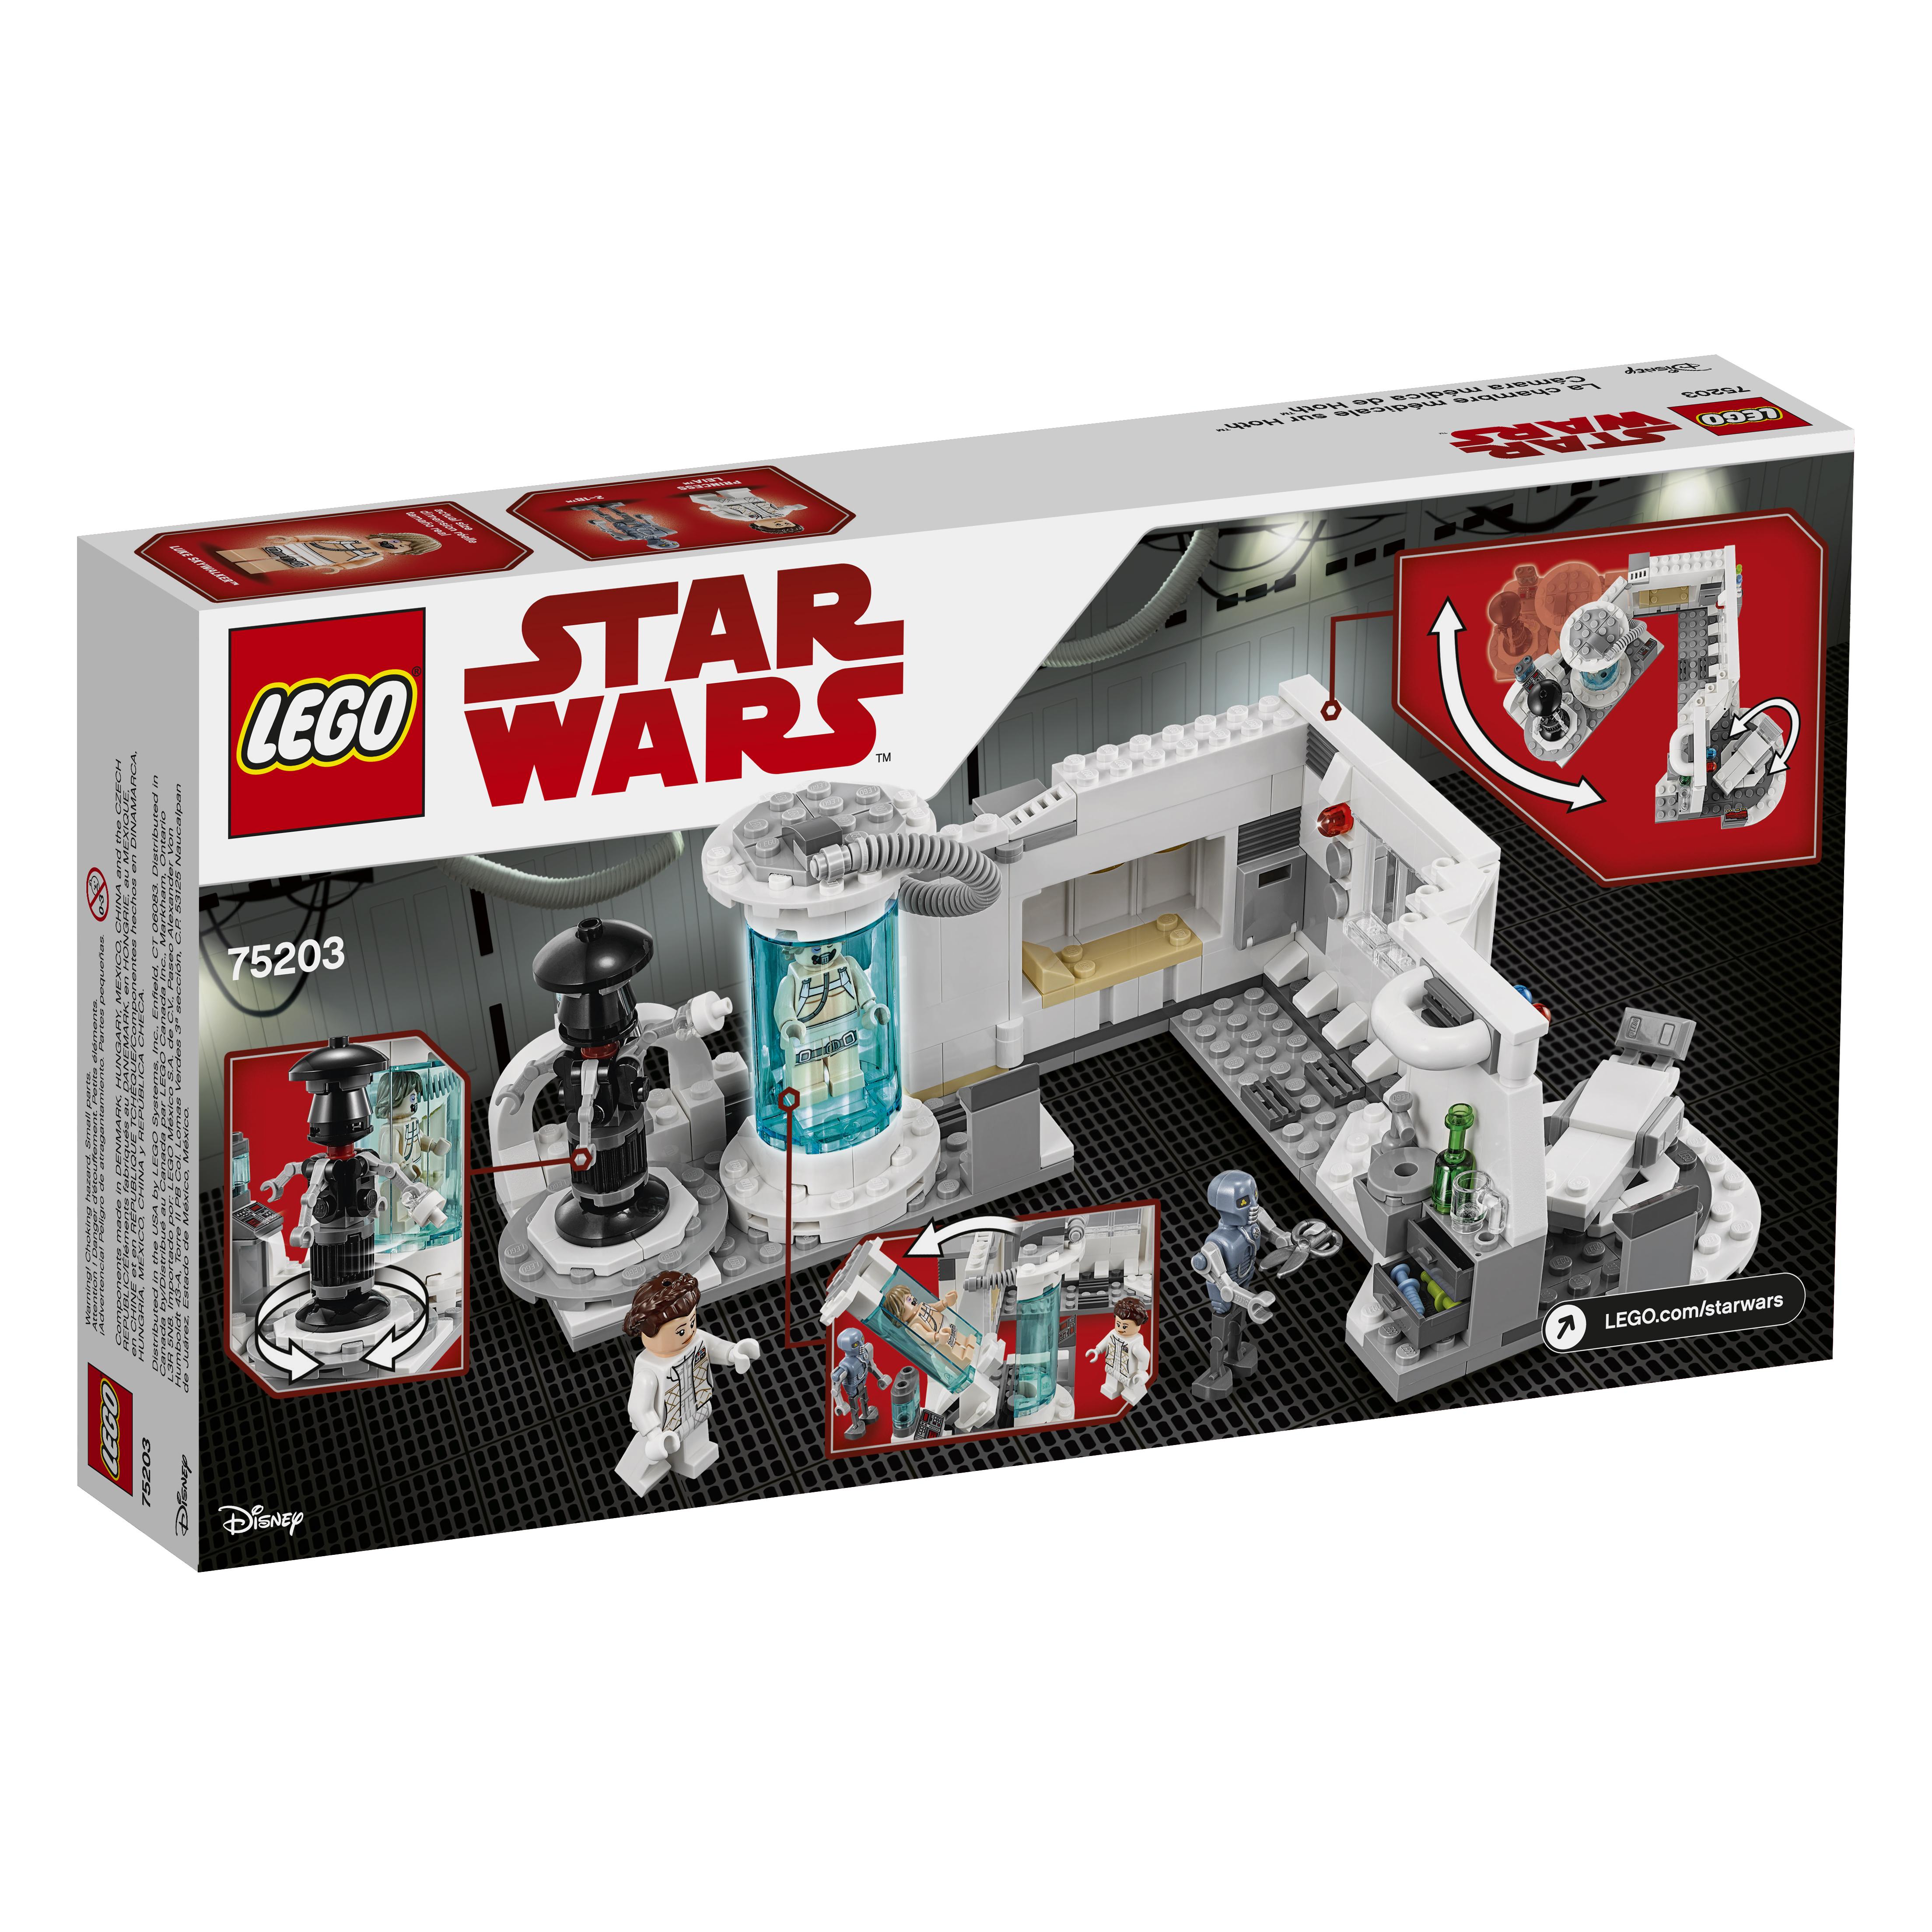 TLJ (TESB) Hoth Medical Chamber Lego Set 2